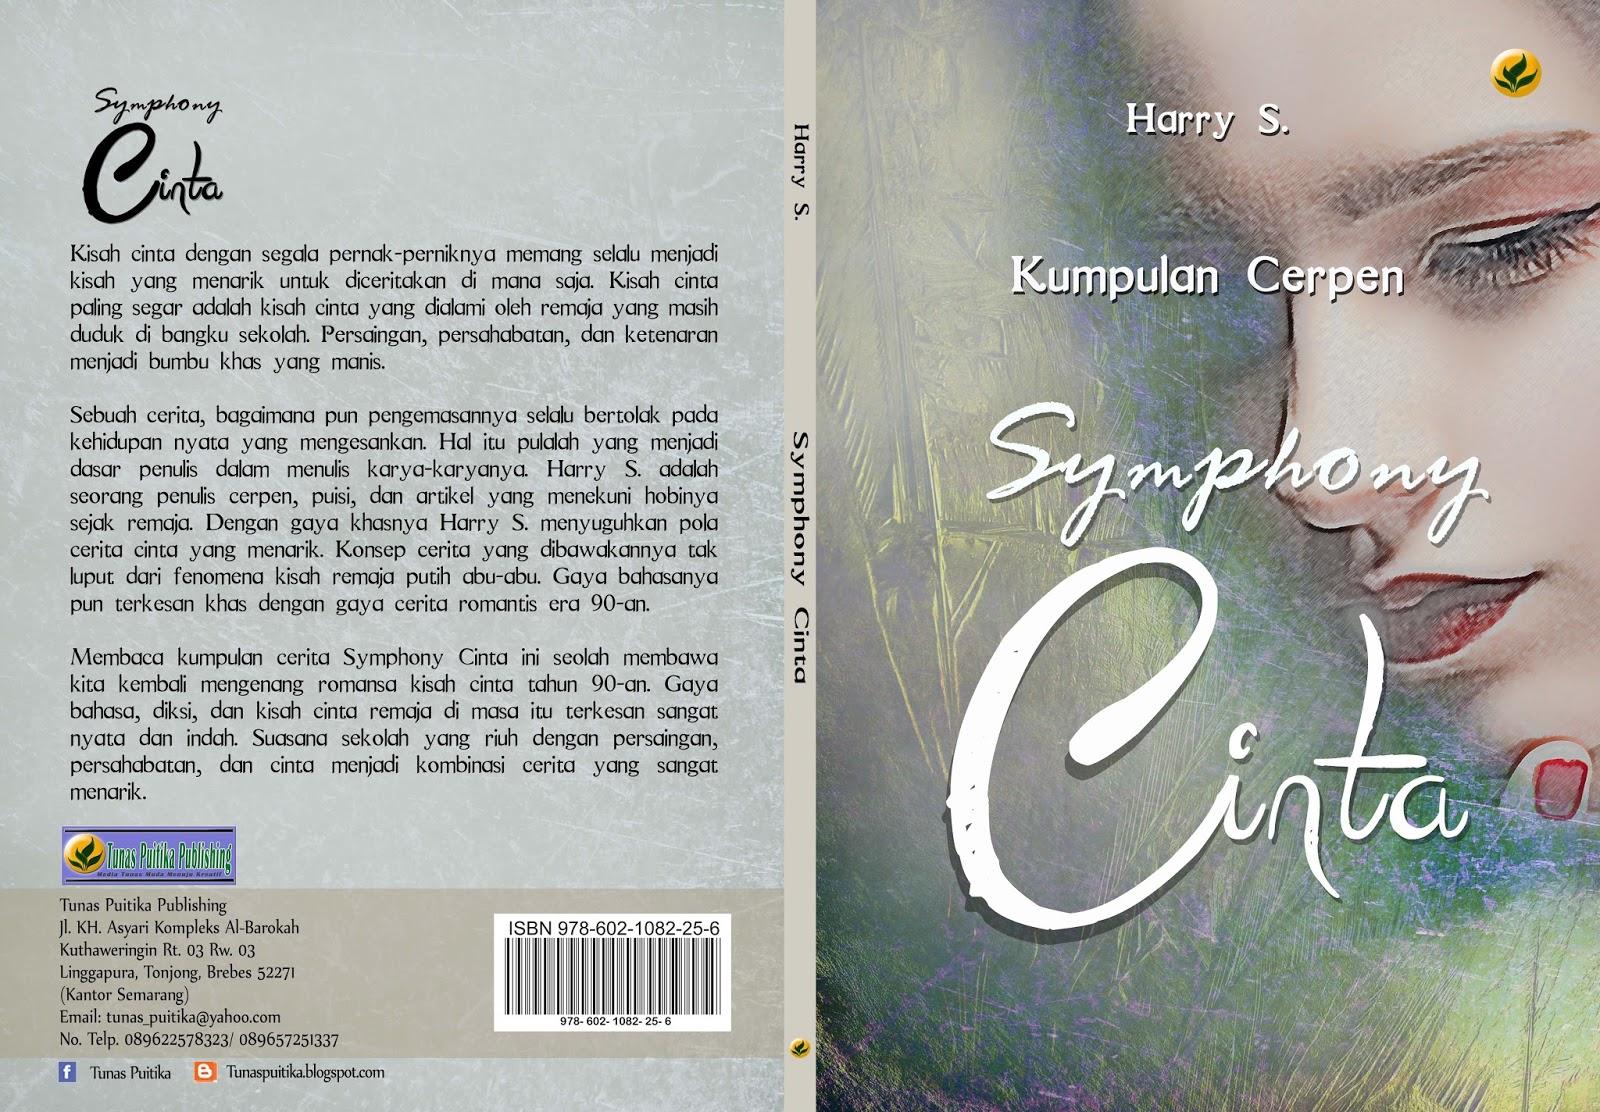 Kumpulan Cerpen Symphony Cinta Tunas Puitika Publishing